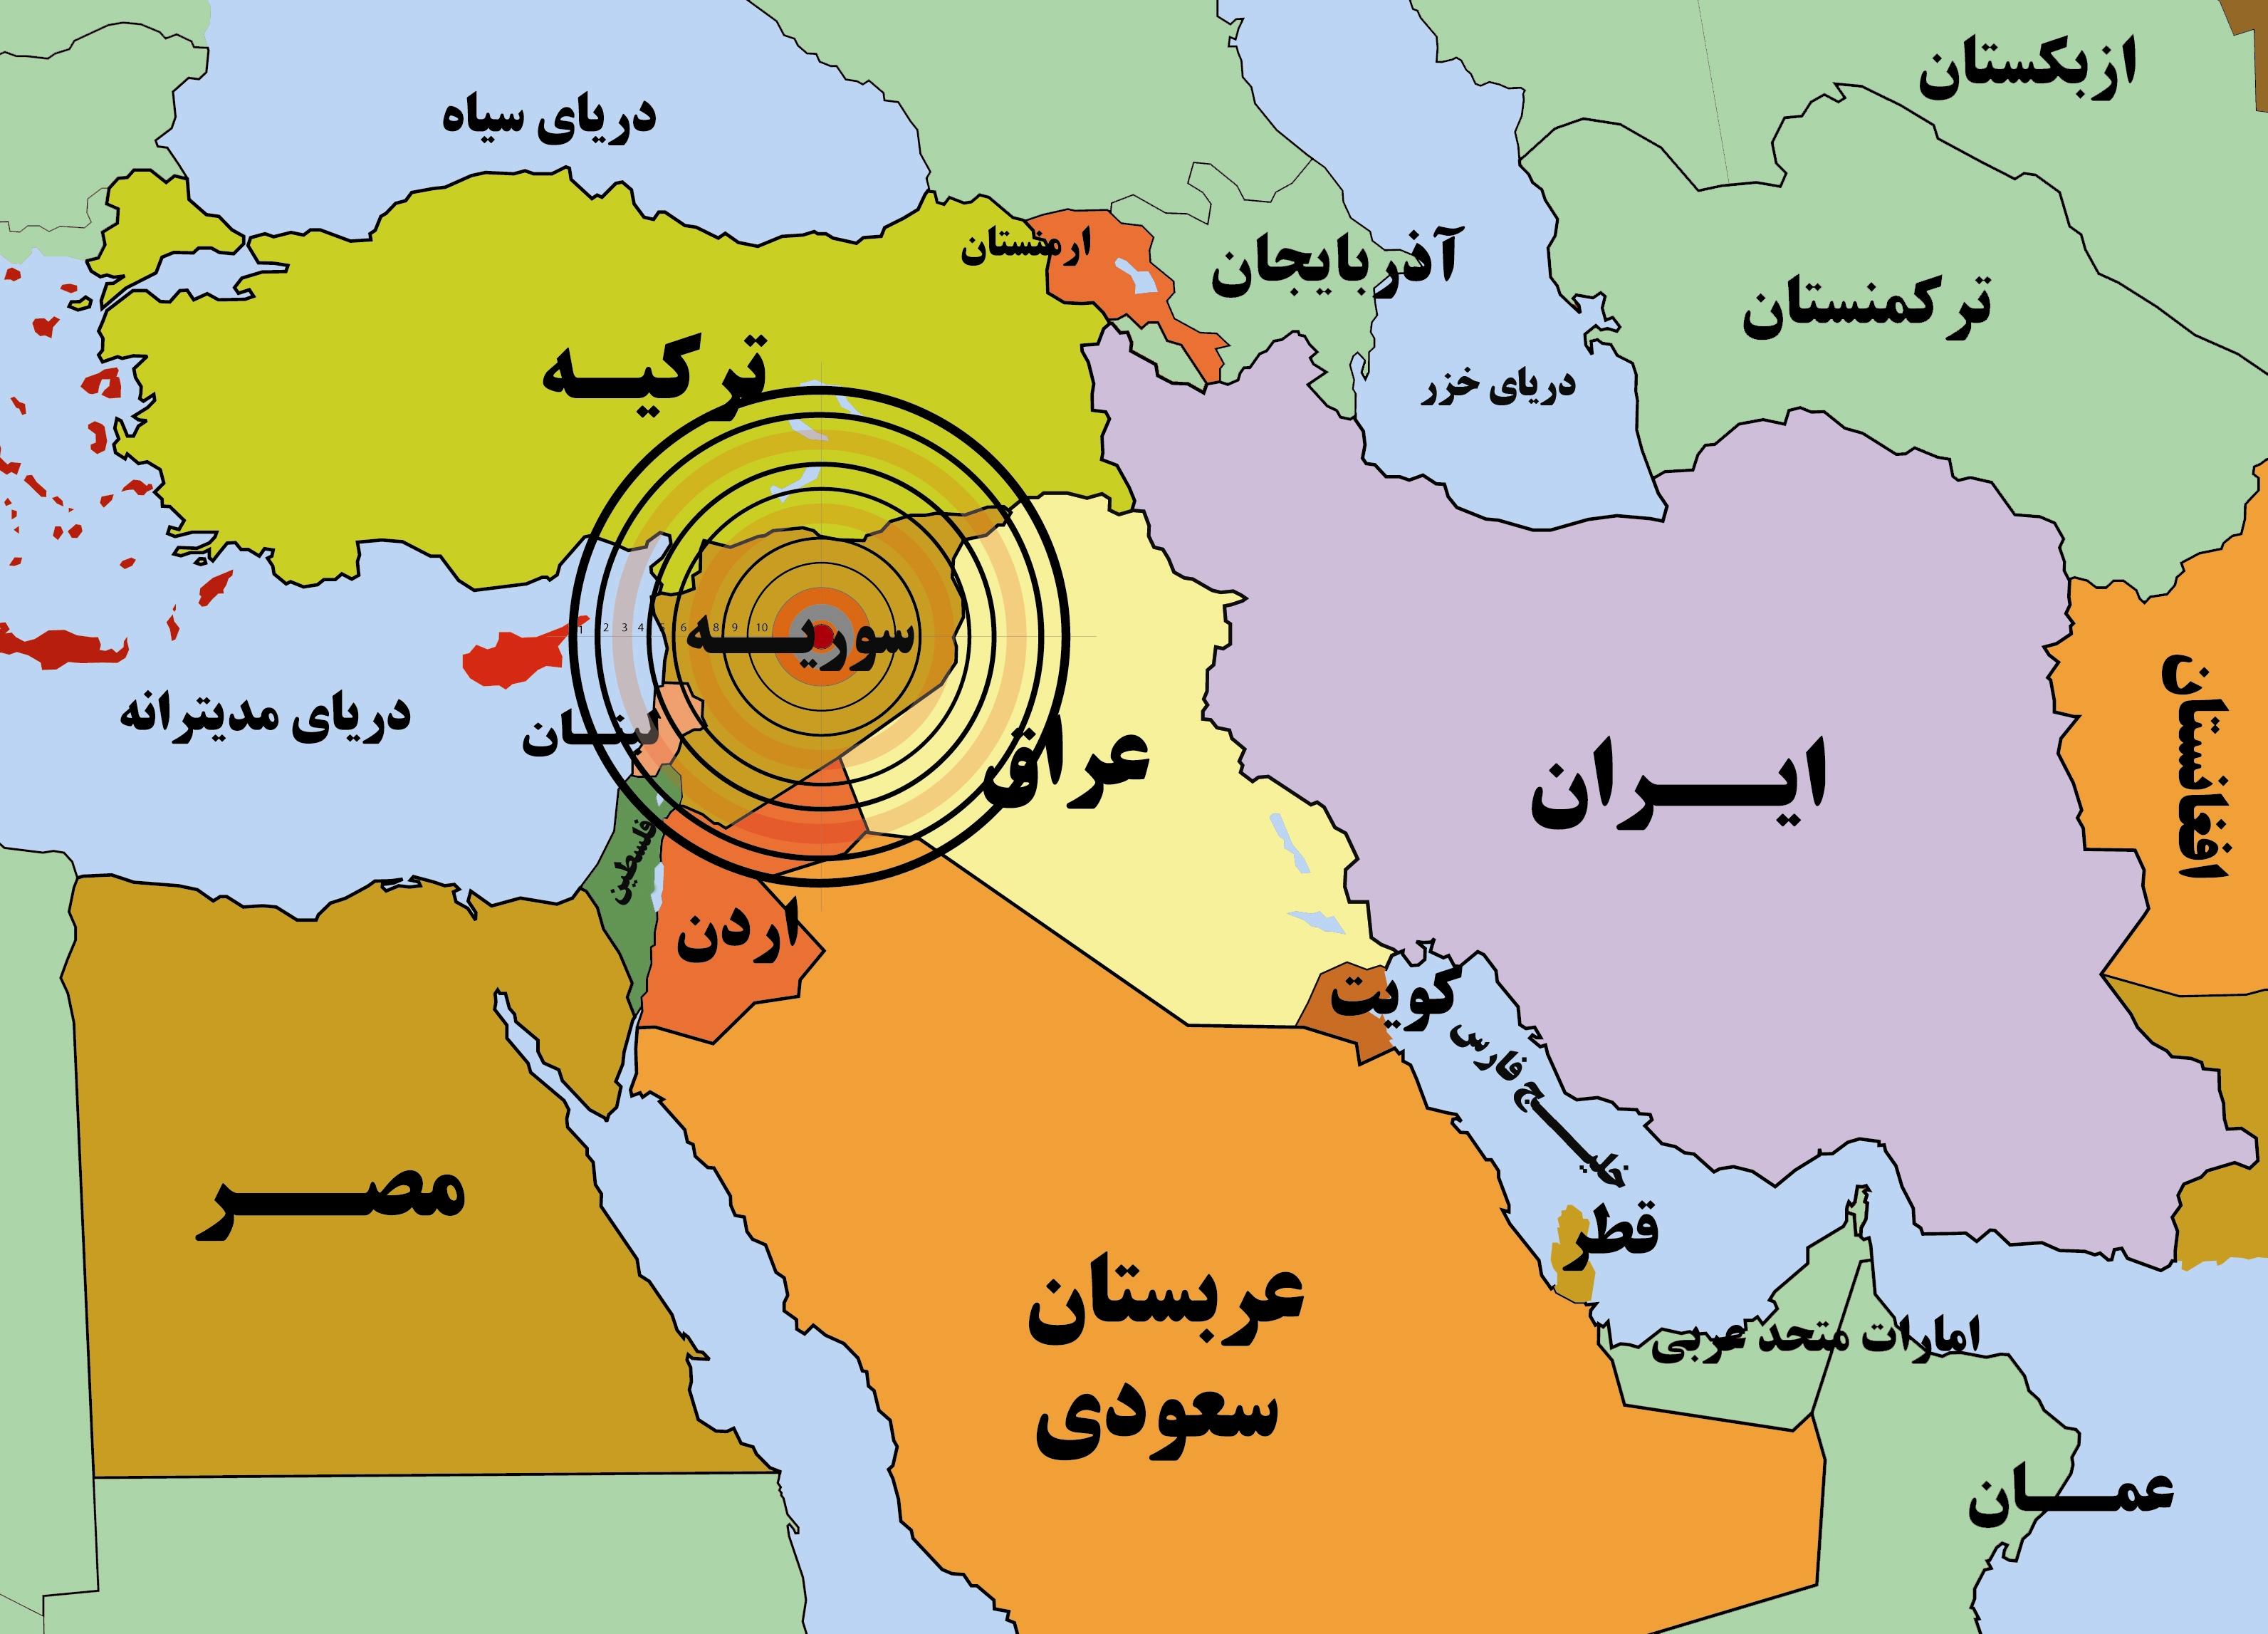 نقشه خاورمیانه -  سوریه